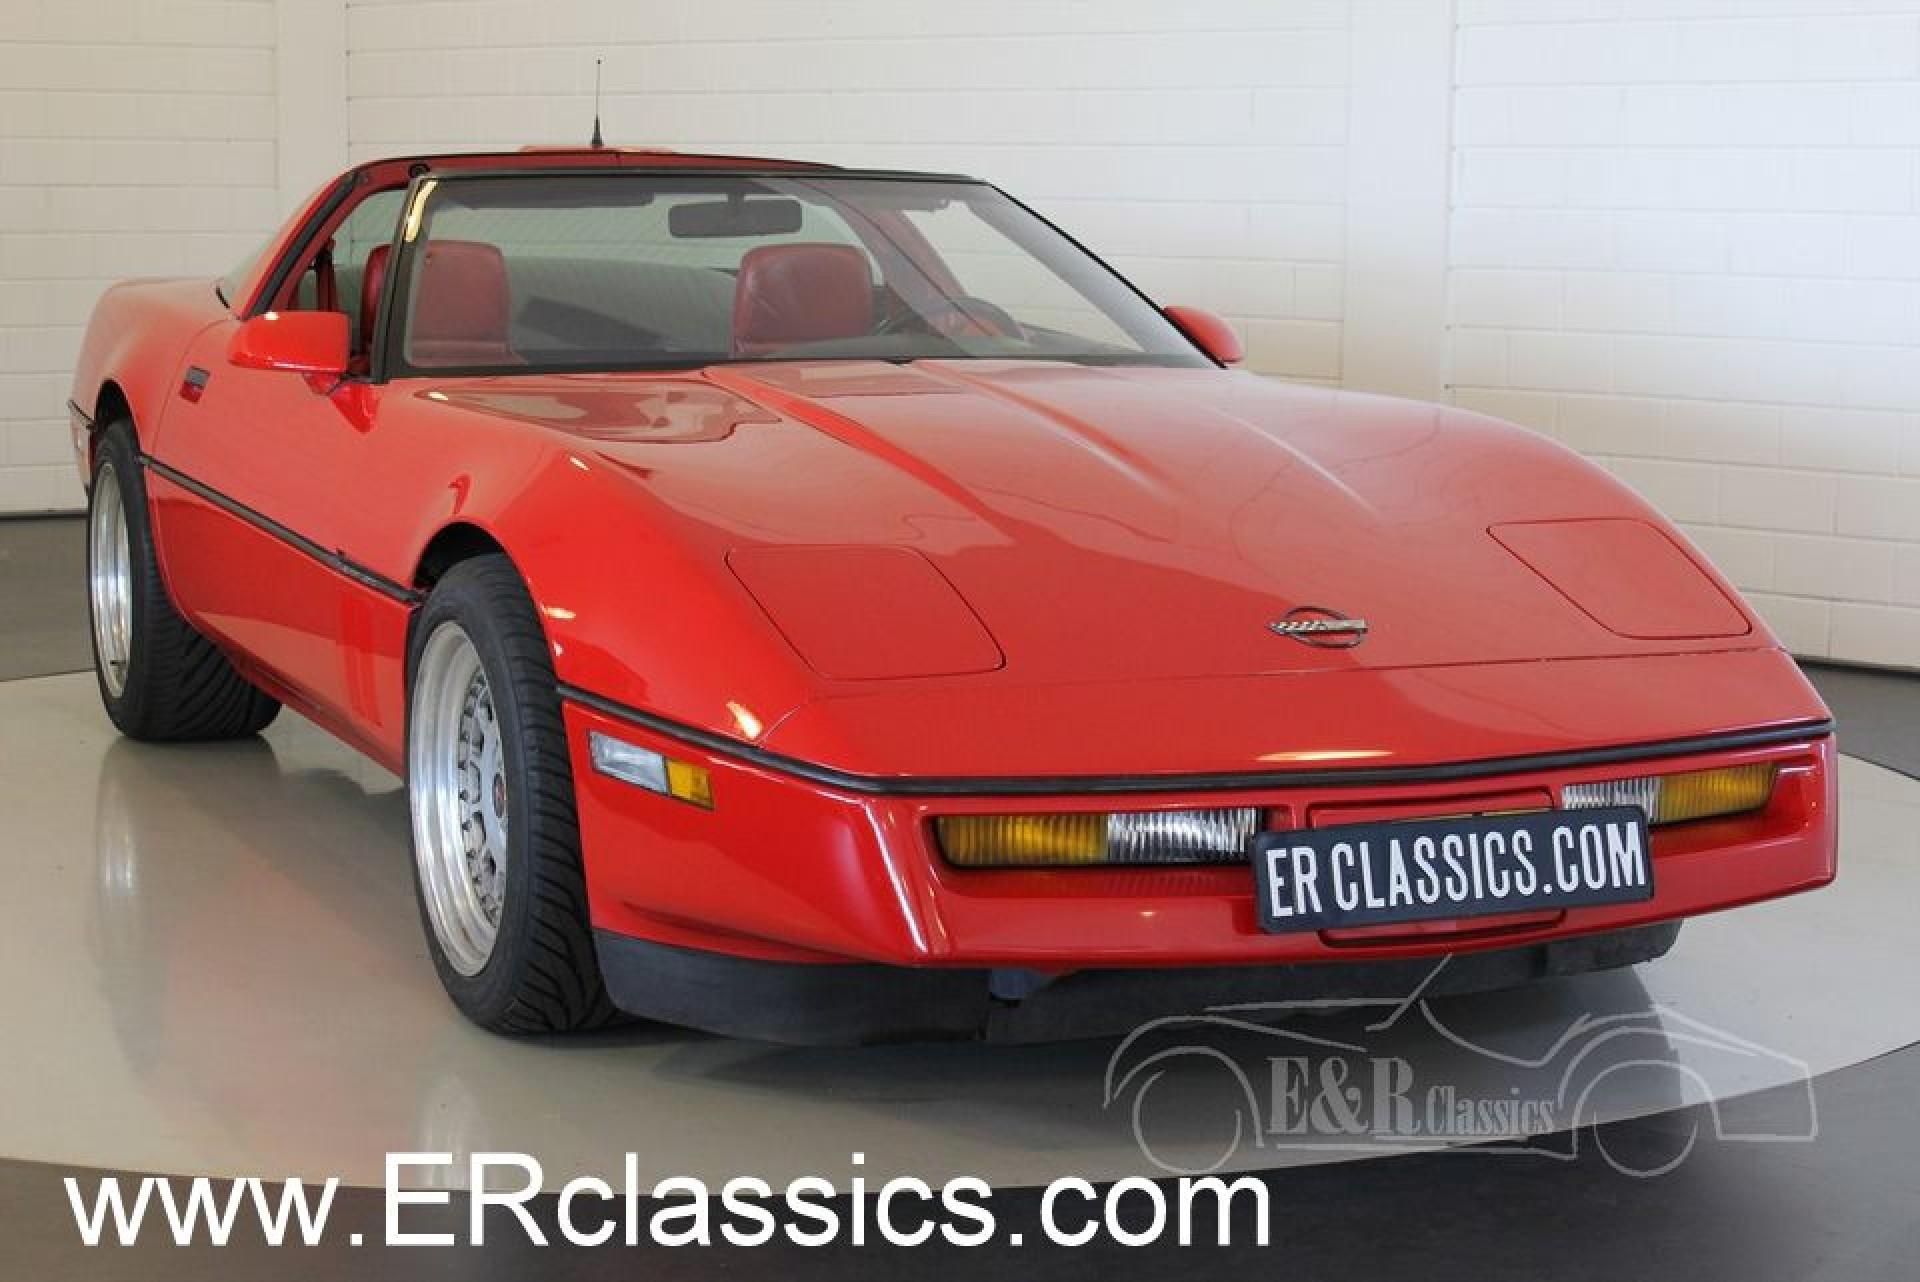 chevrolet corvette zr 1 c4 targa 1990 for sale at erclassics rh erclassics  com C5 Corvette Interior C5 Corvette Interior